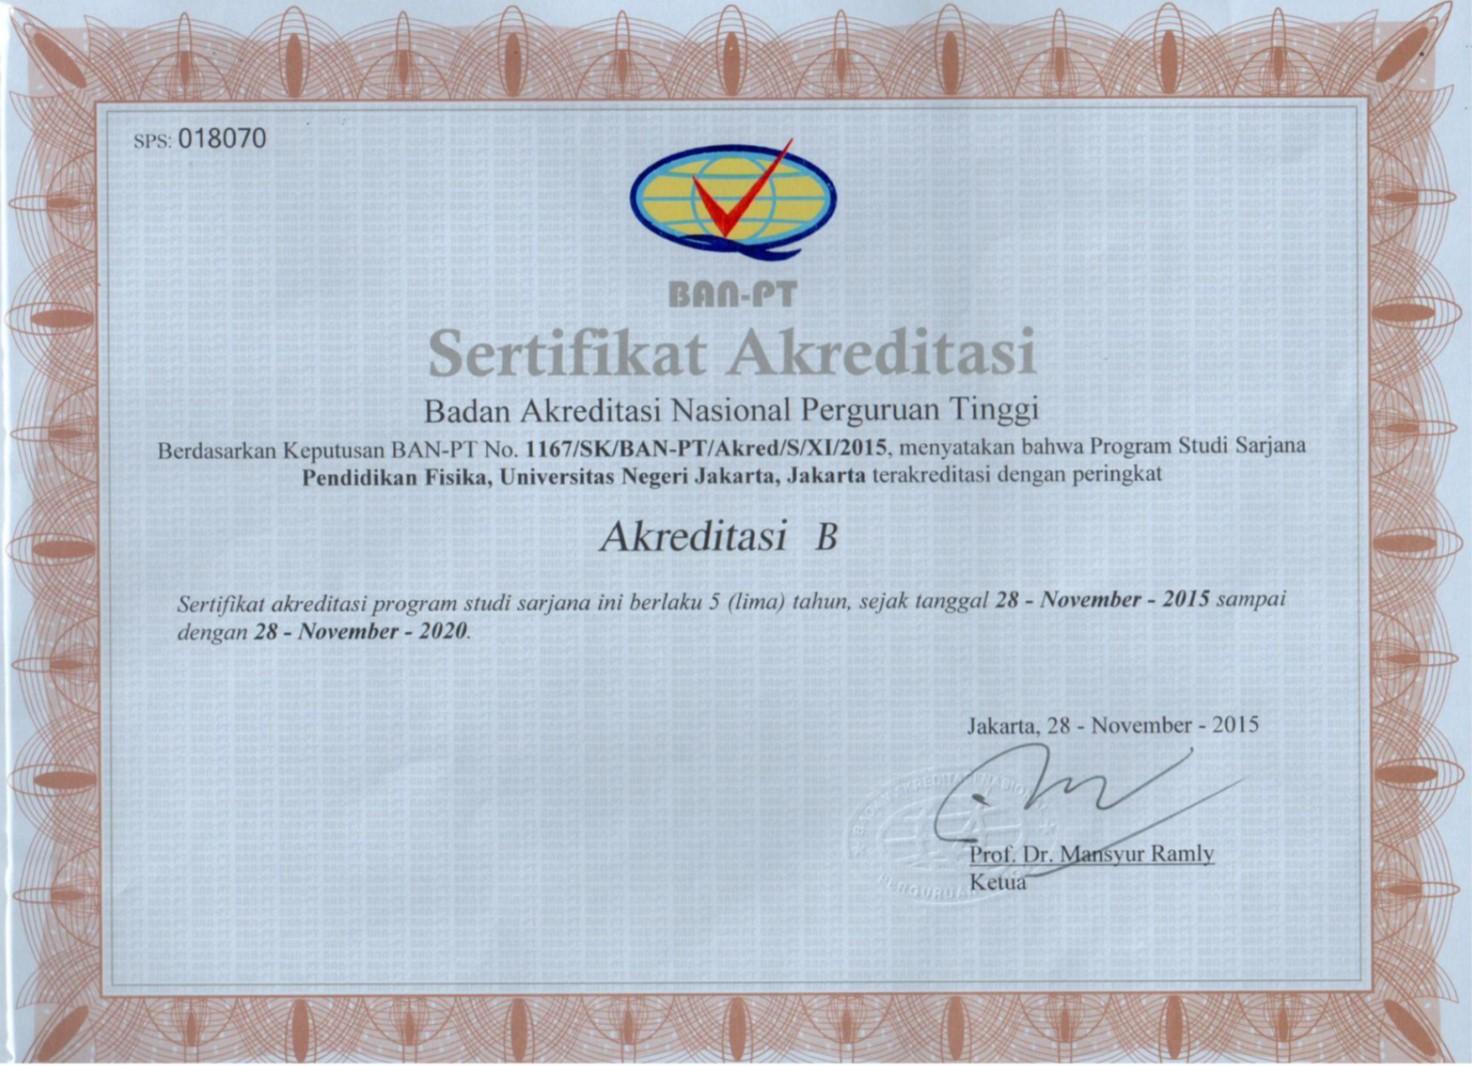 Akreditasi-PF2015-2020.emf